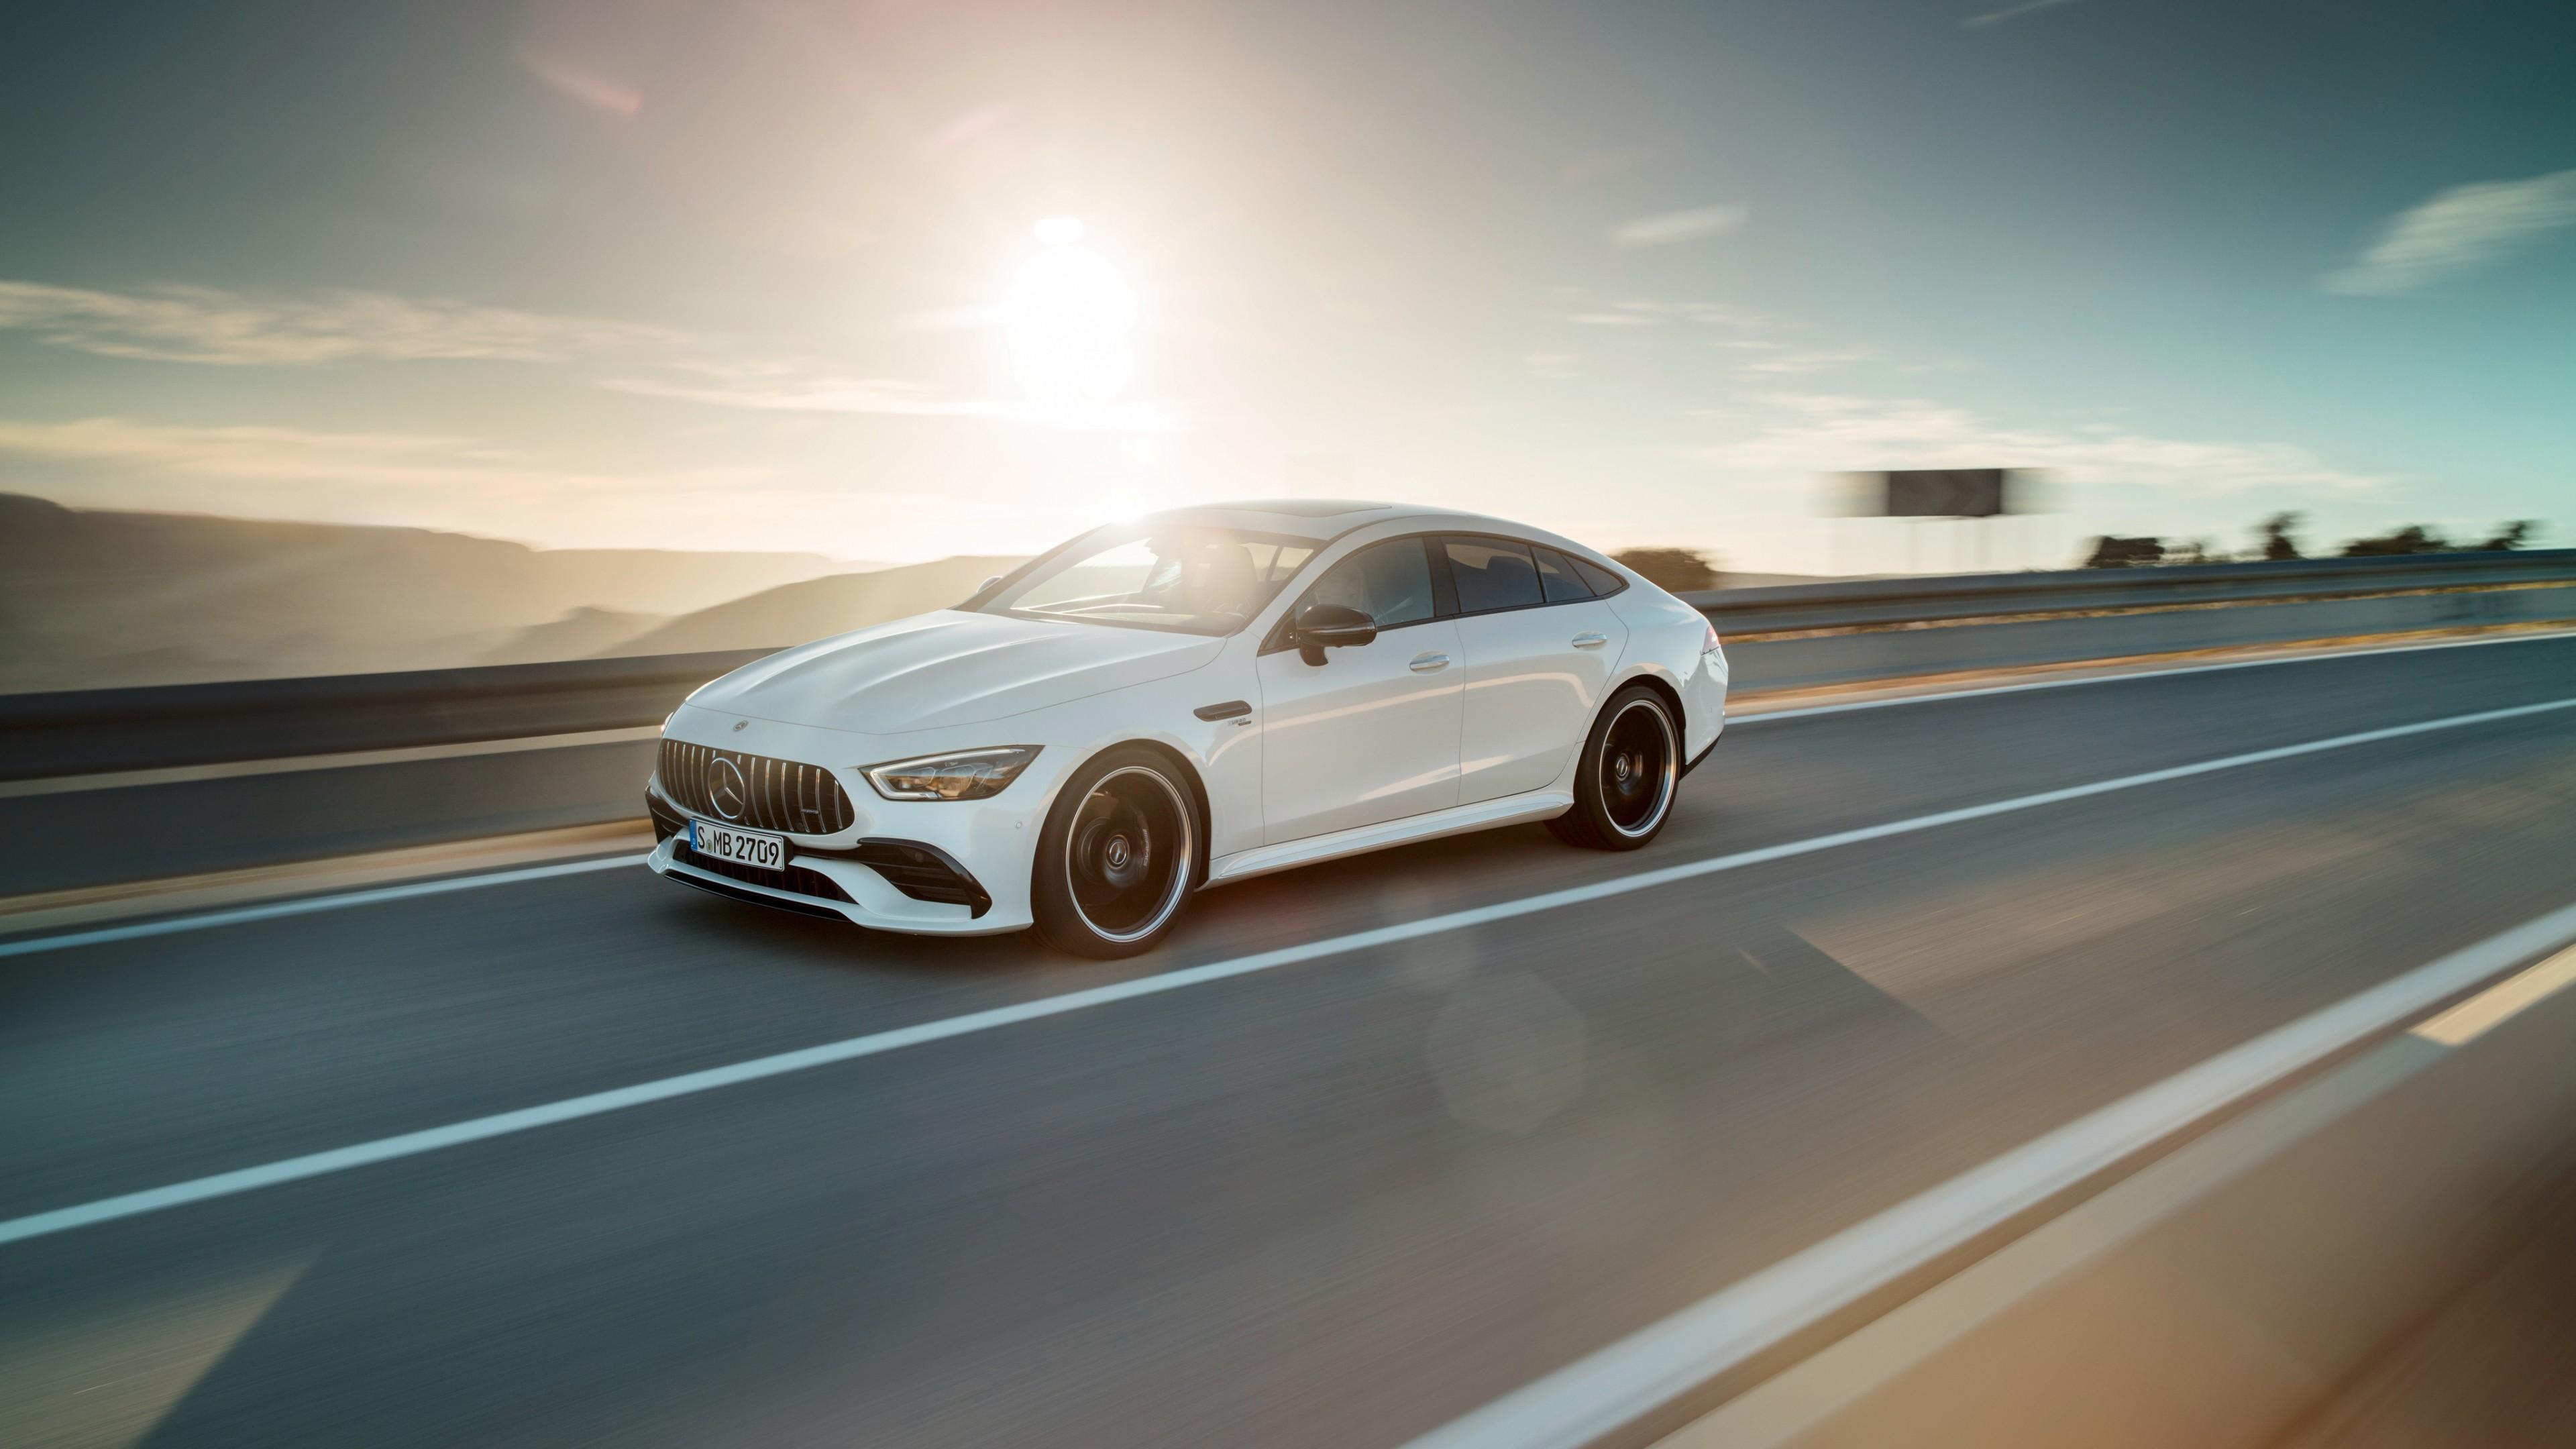 4 Matic Benz >> 2018 Mercedes AMG GT 53 4Matic 4 Door Coupe 4K 2 Wallpaper | HD Car Wallpapers | ID #9918